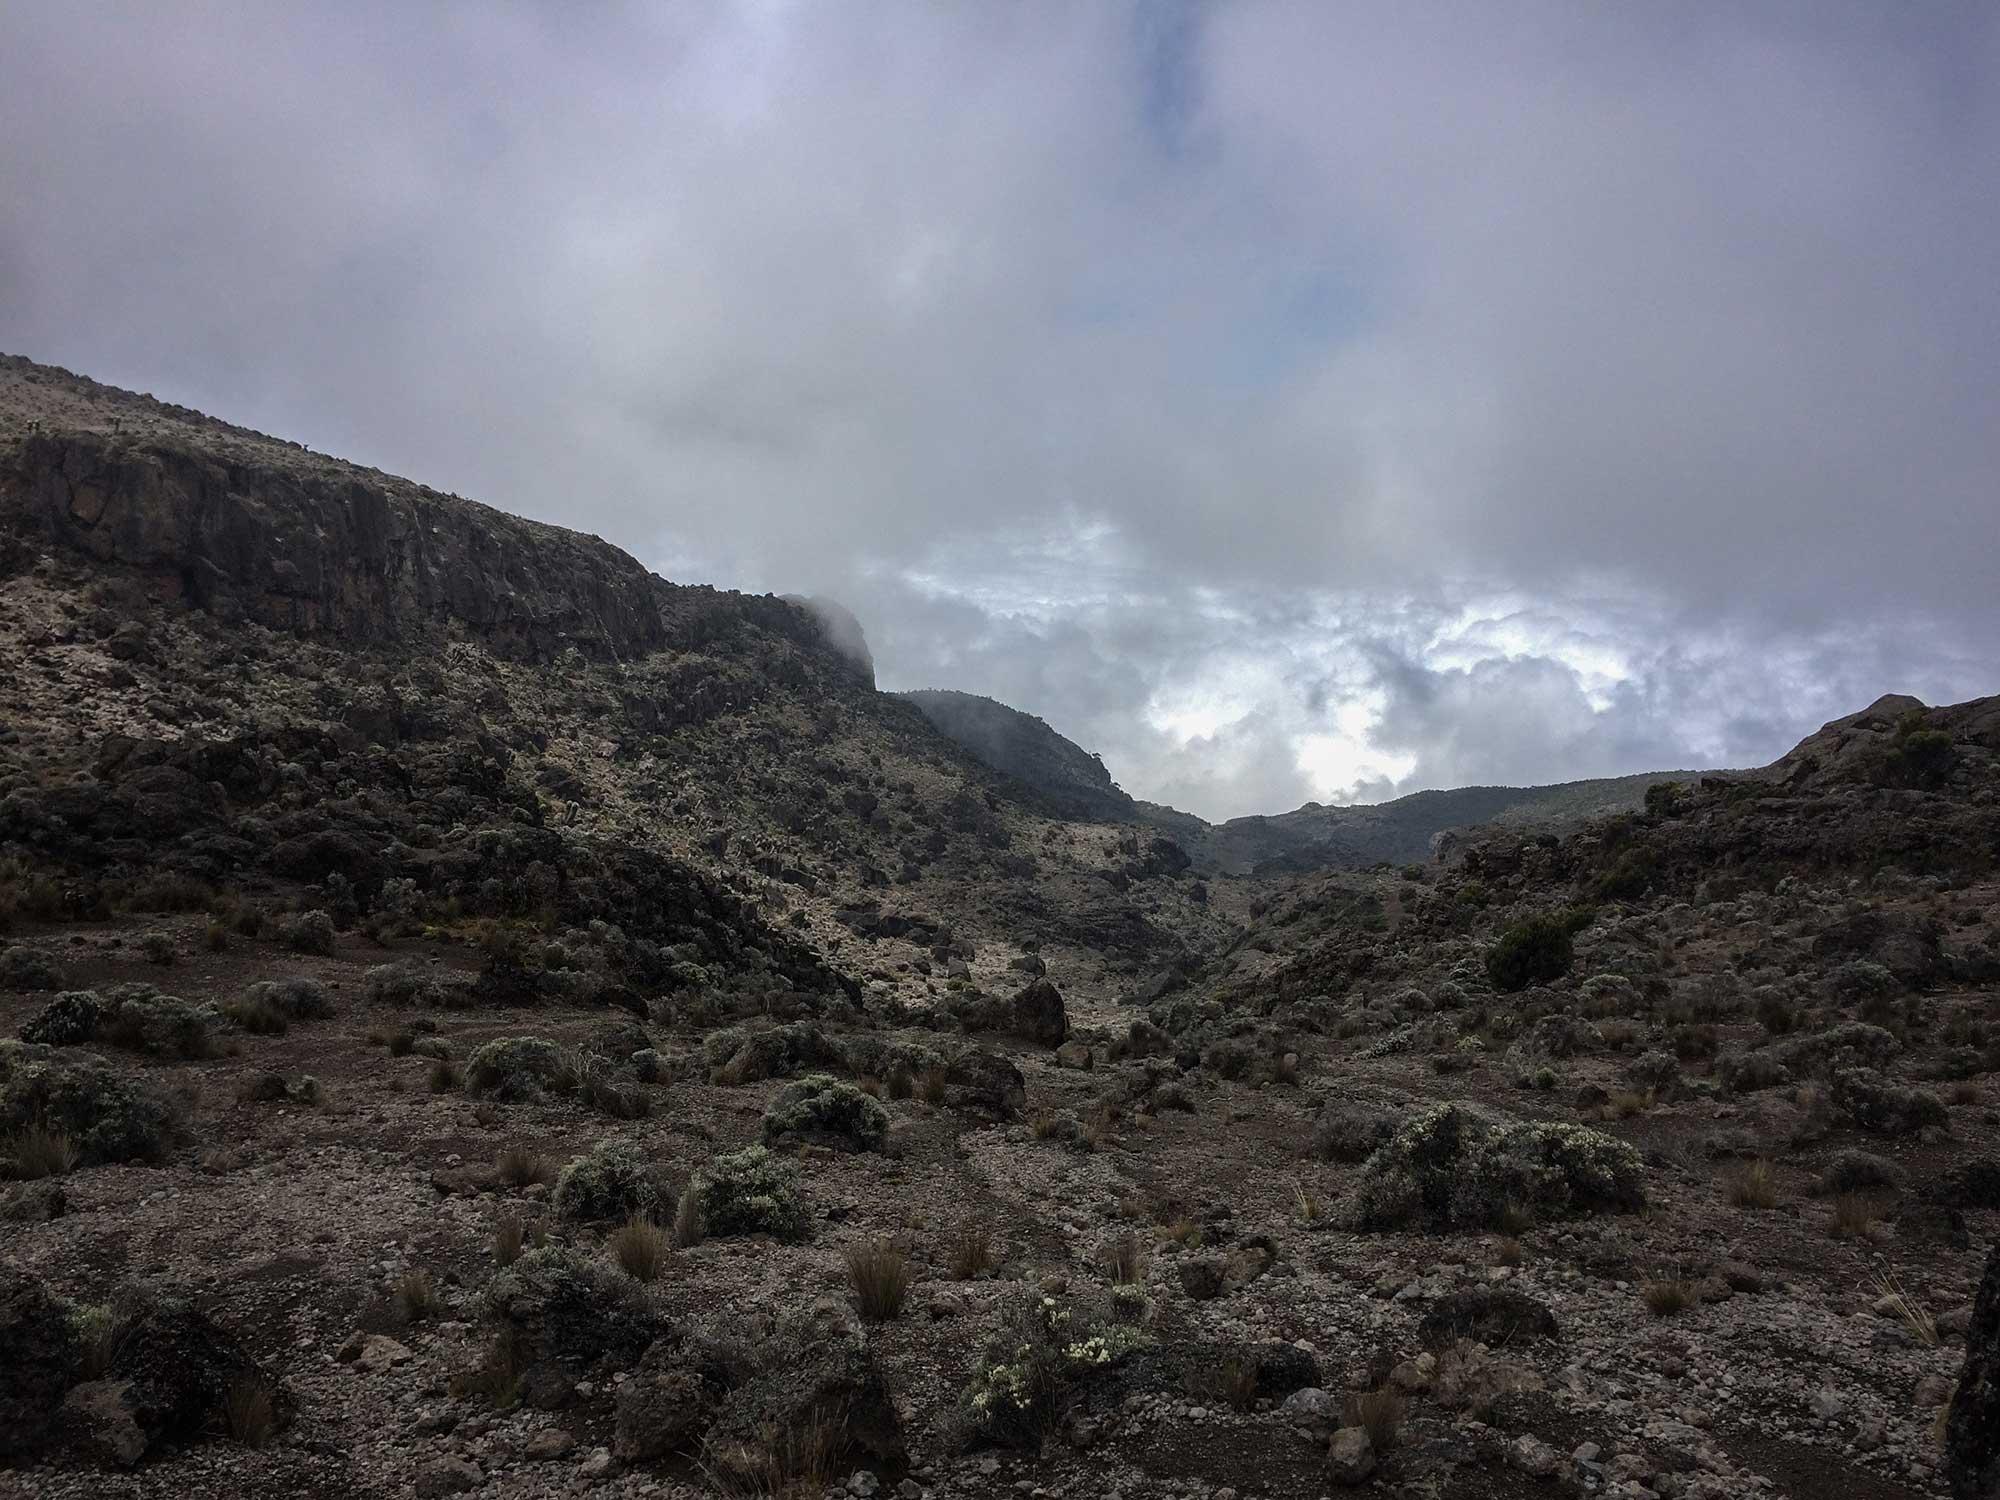 D5-15-heading-to-karanga-camp-kilimanjaro.jpg